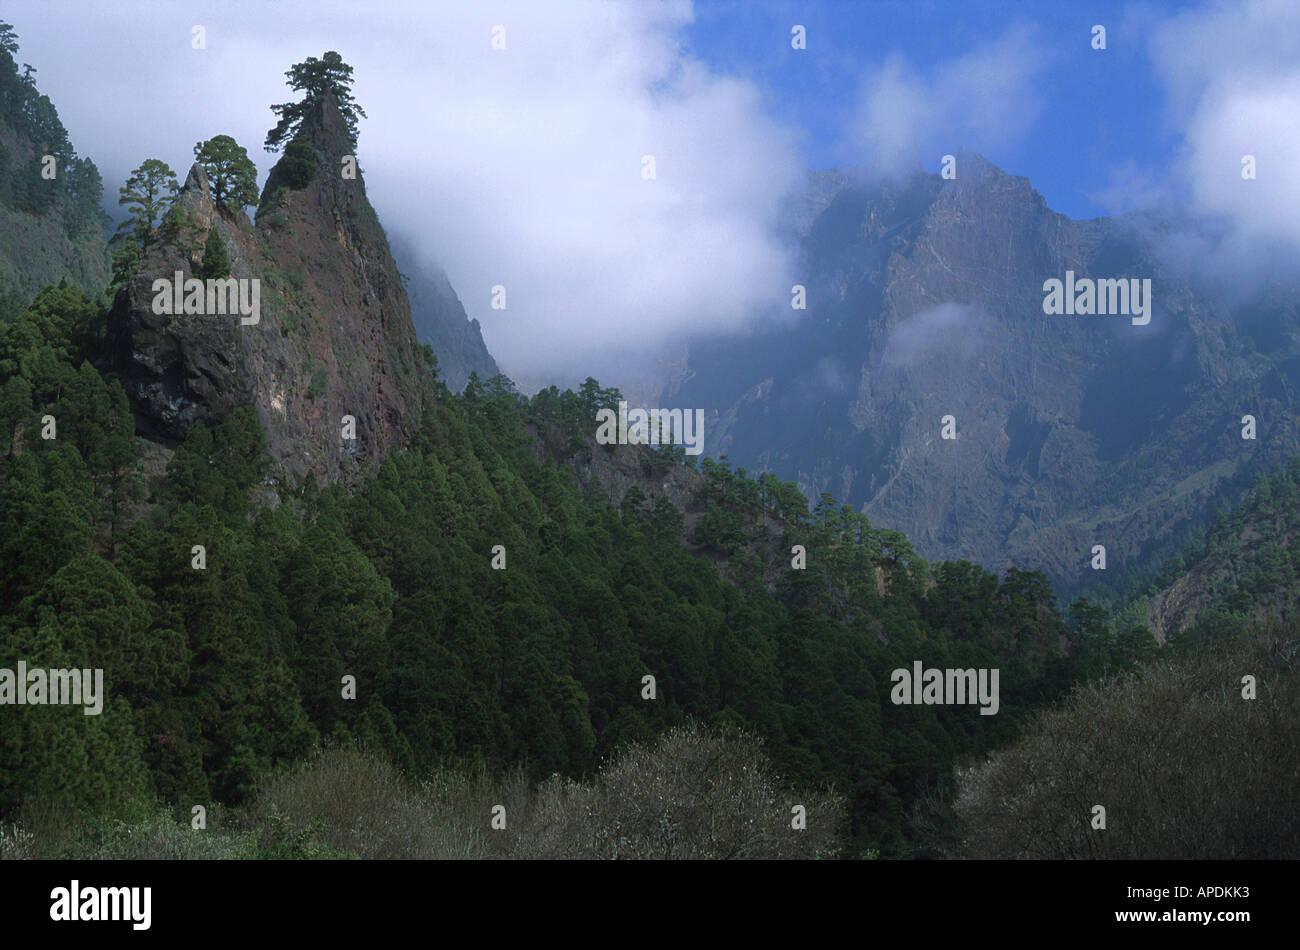 Roque del Huso im Krater, NP Caldera de Taburiente La Palma, Kanarische Inseln - Stock Image